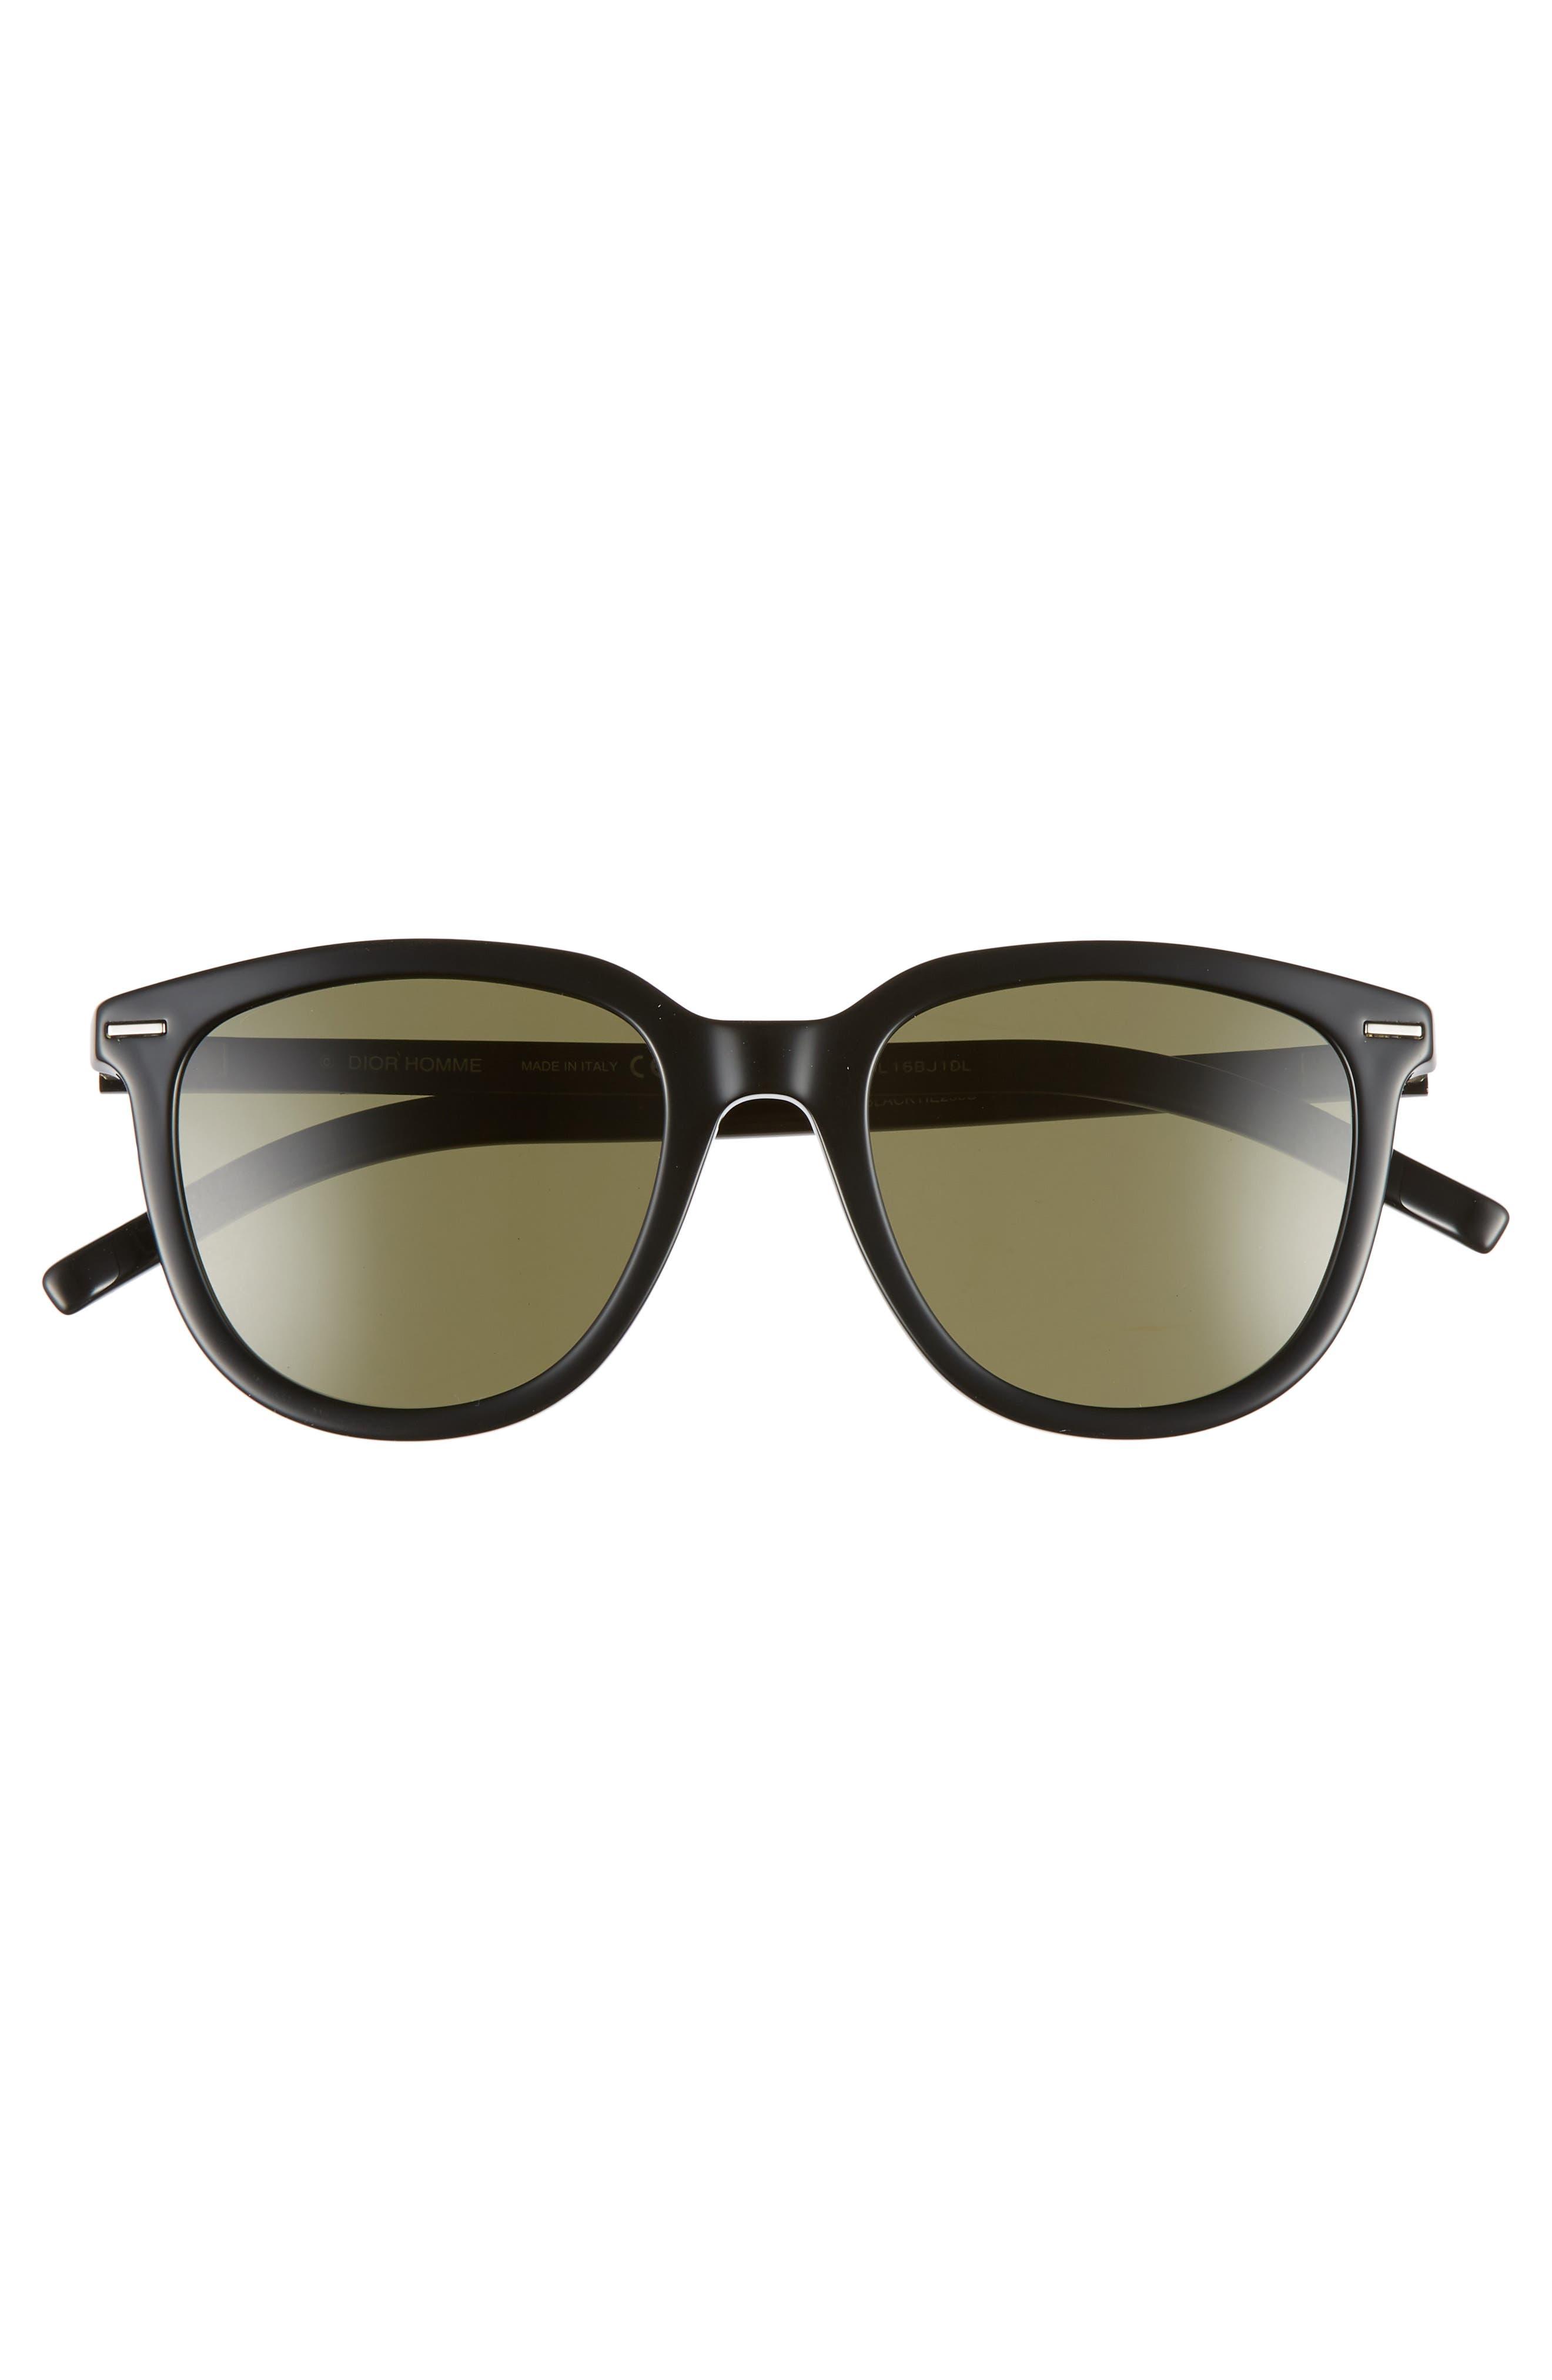 51mm Sunglasses,                             Alternate thumbnail 3, color,                             BLACK